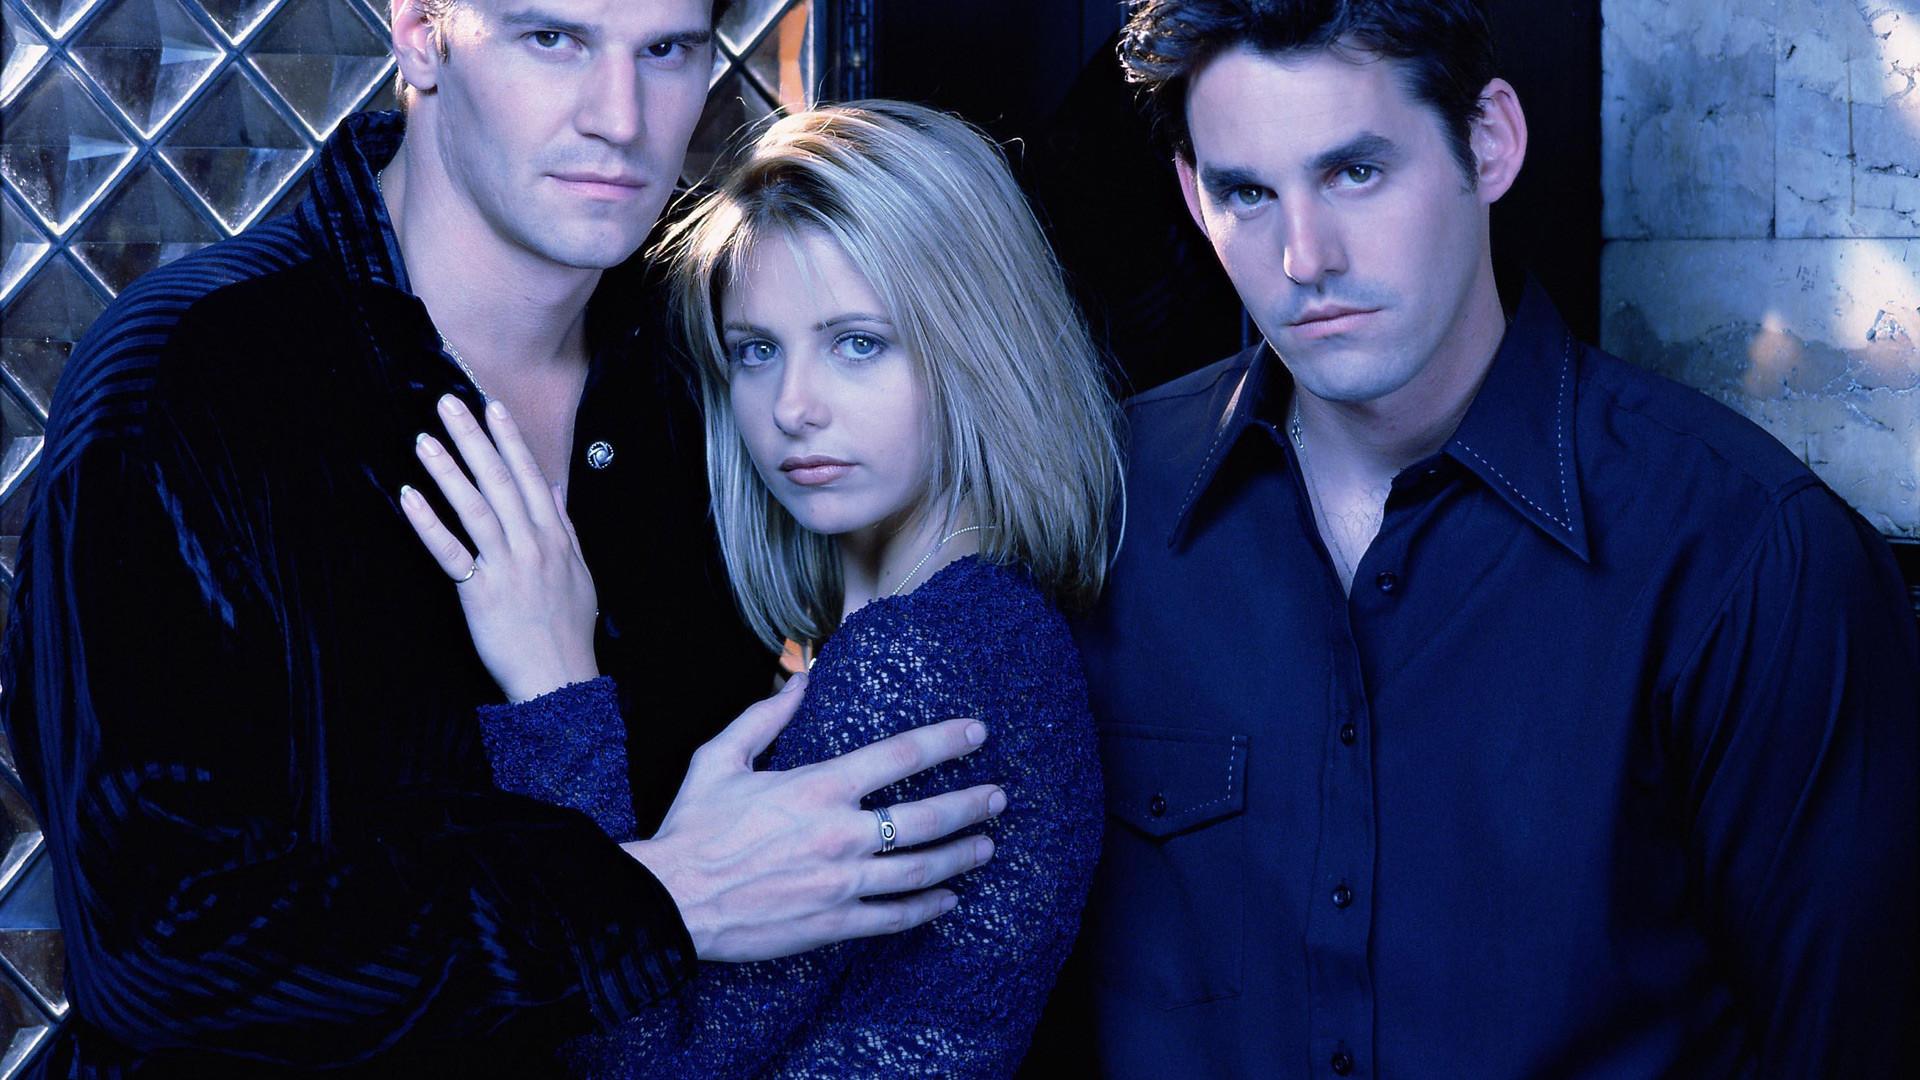 Undead TV: Essays on Buffy the Vampire Slayer